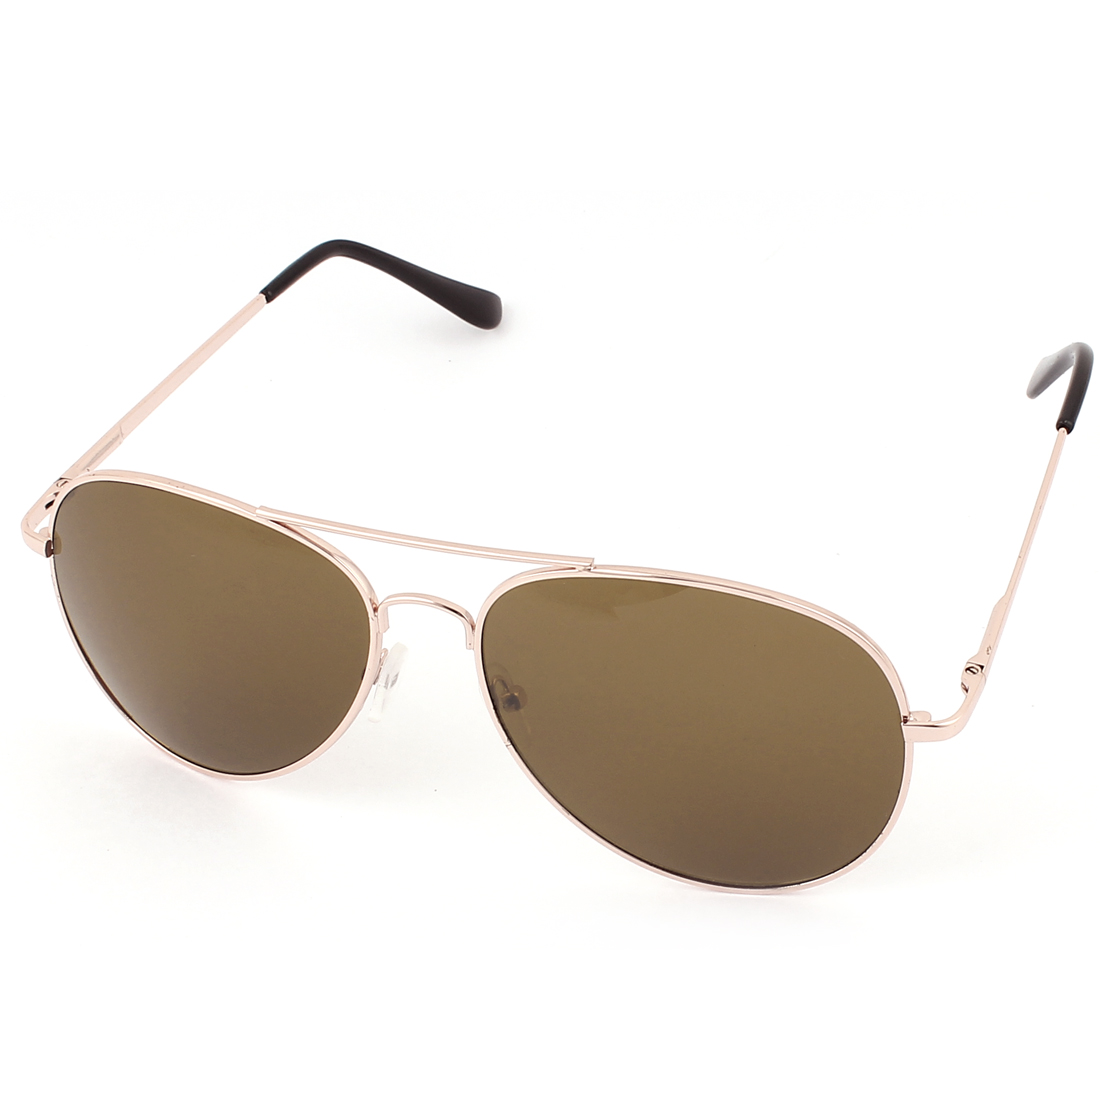 Men Outdoor Casual Double Bridge Gold Tone Metal Full Frame Brown Waterdrop Lens Sunglasses Eyewear Eye Protector Glasses